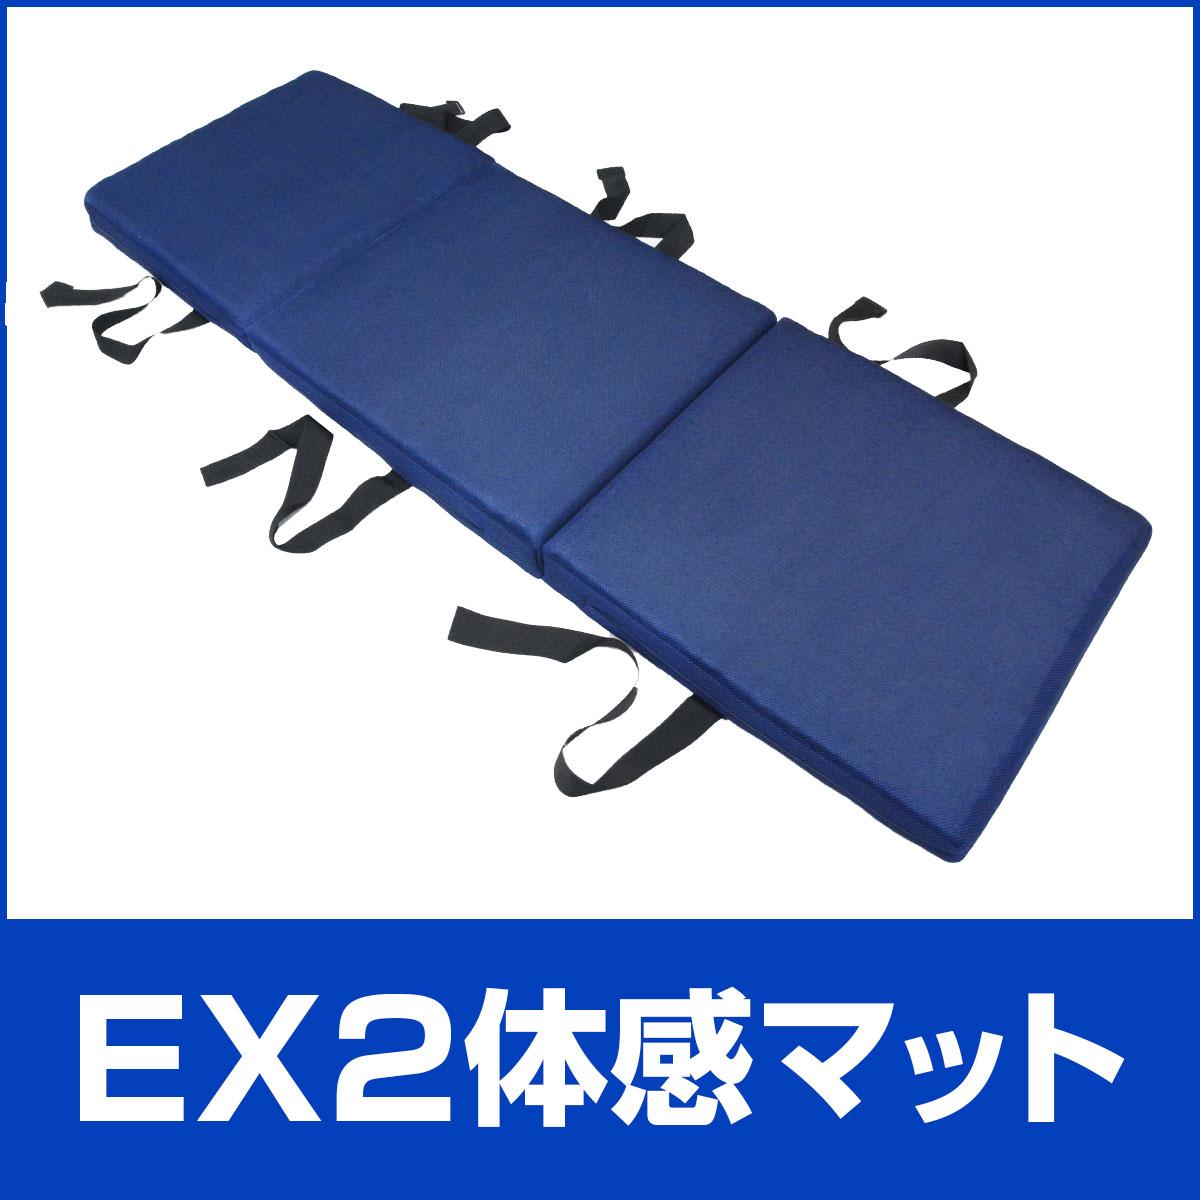 FOUR SEASONS EX2体感マット